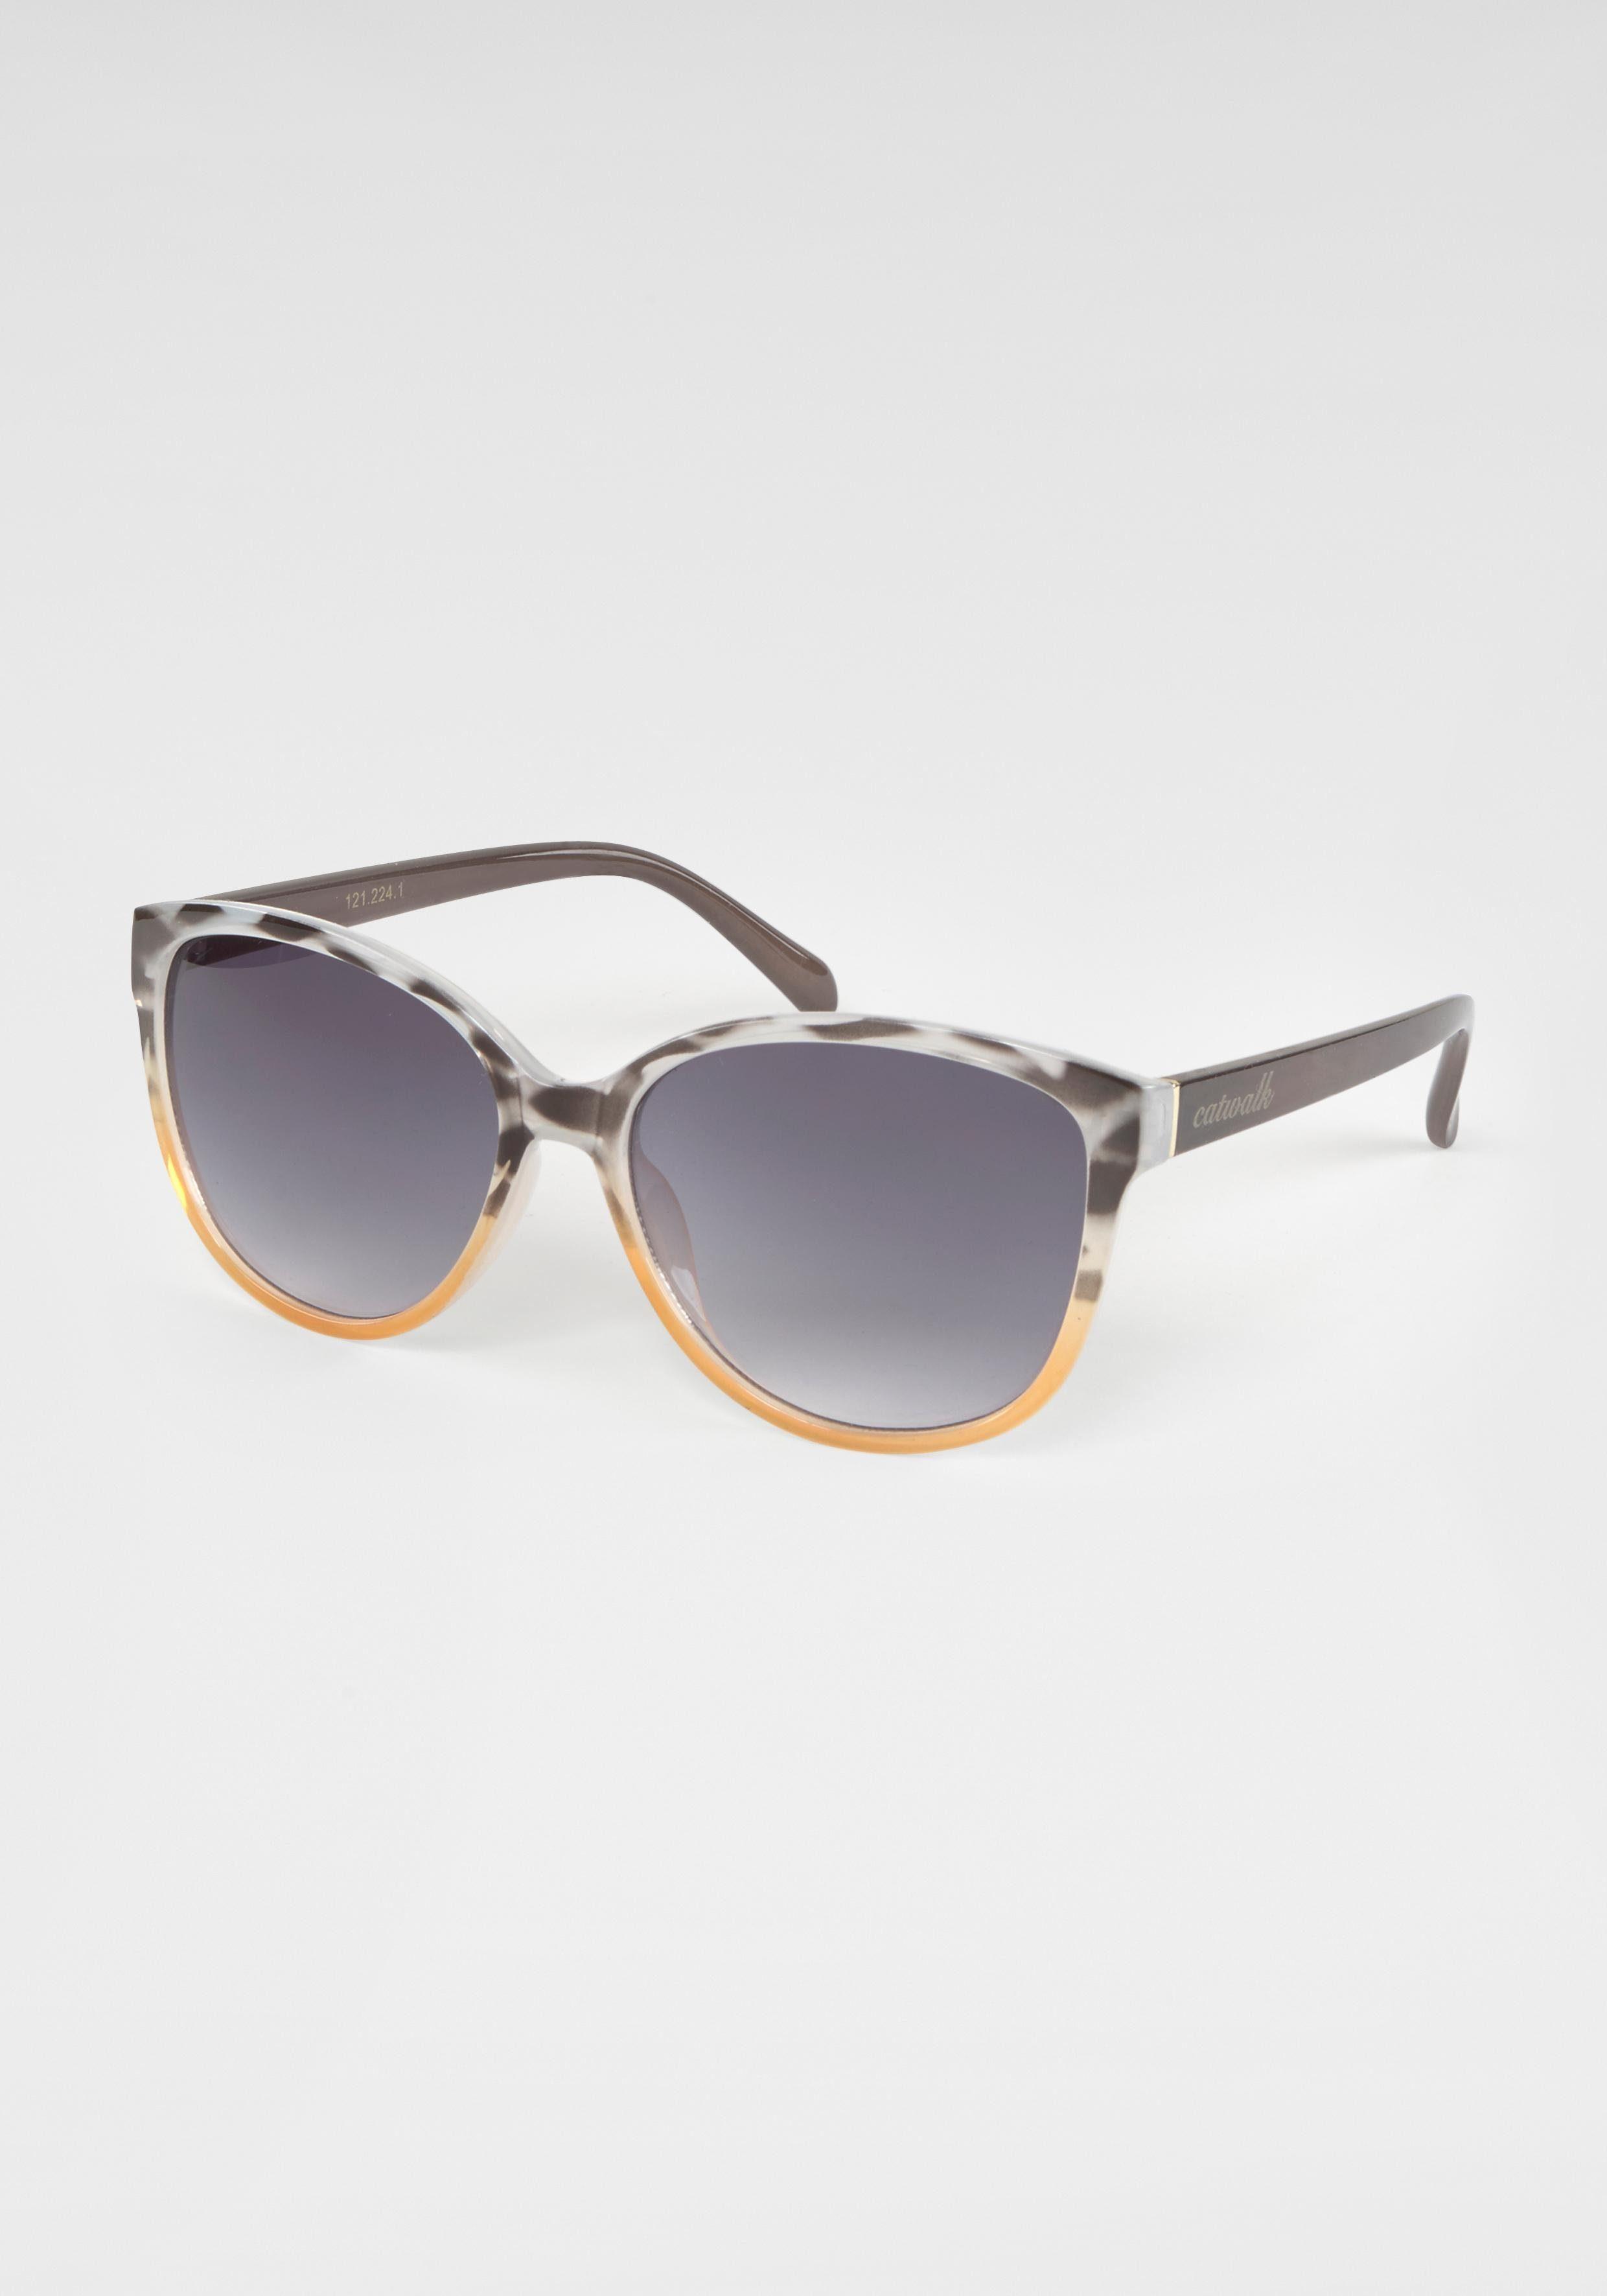 catwalk Eyewear Sonnenbrille (1-St) Damen Sonnenbrille, Animal Look, Bicolor